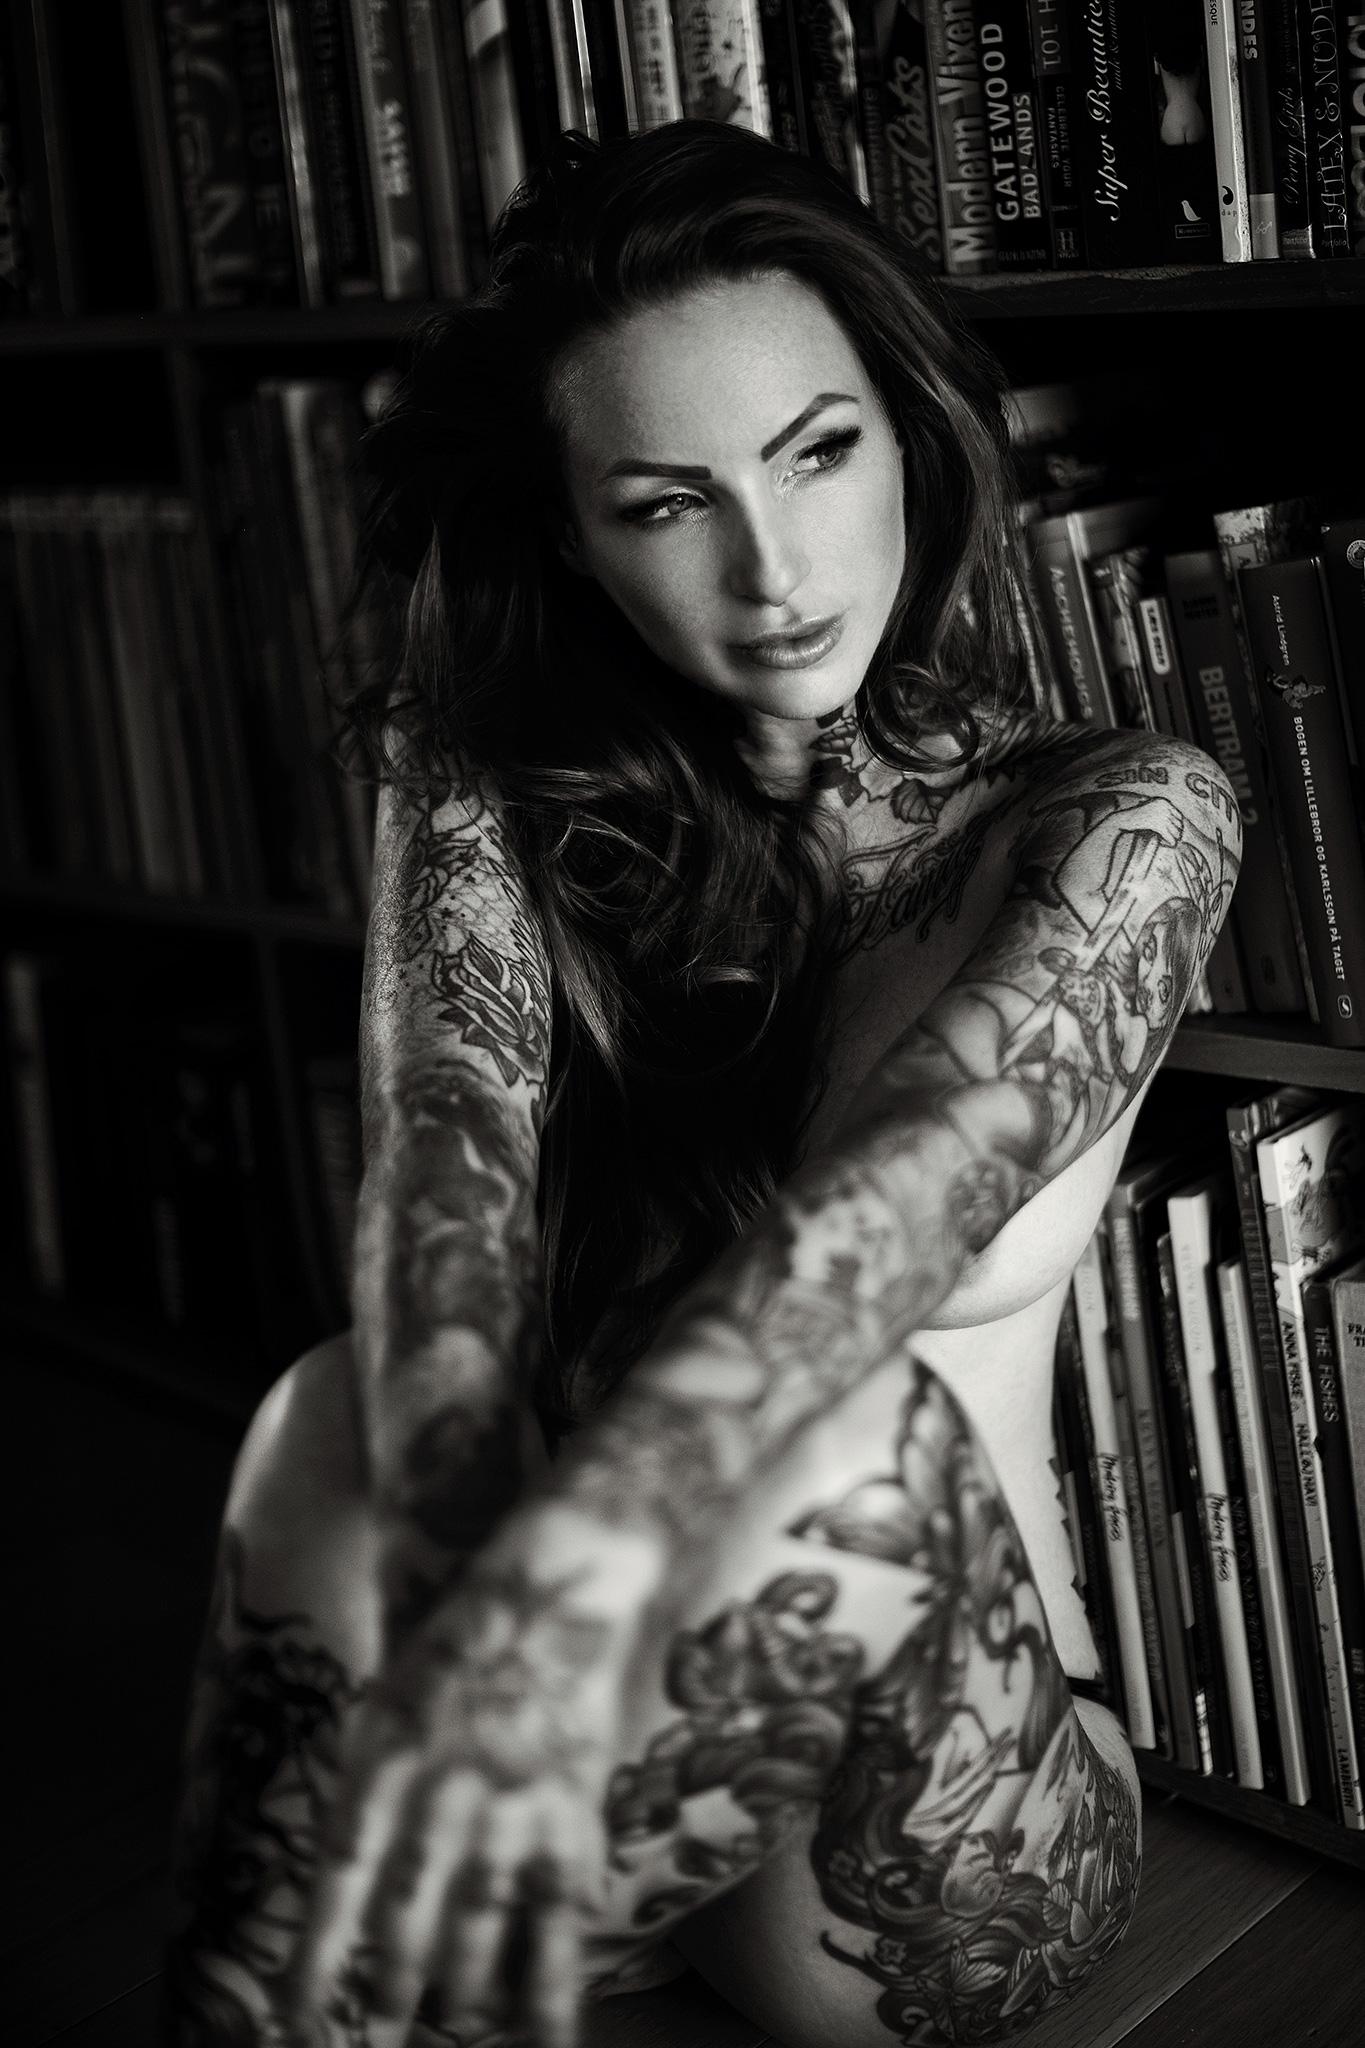 Mikkel_Laumann_Photography_Anne_Lindfjeld_Reroute_To_Remain_Photoshoot_Magazine_08.jpg